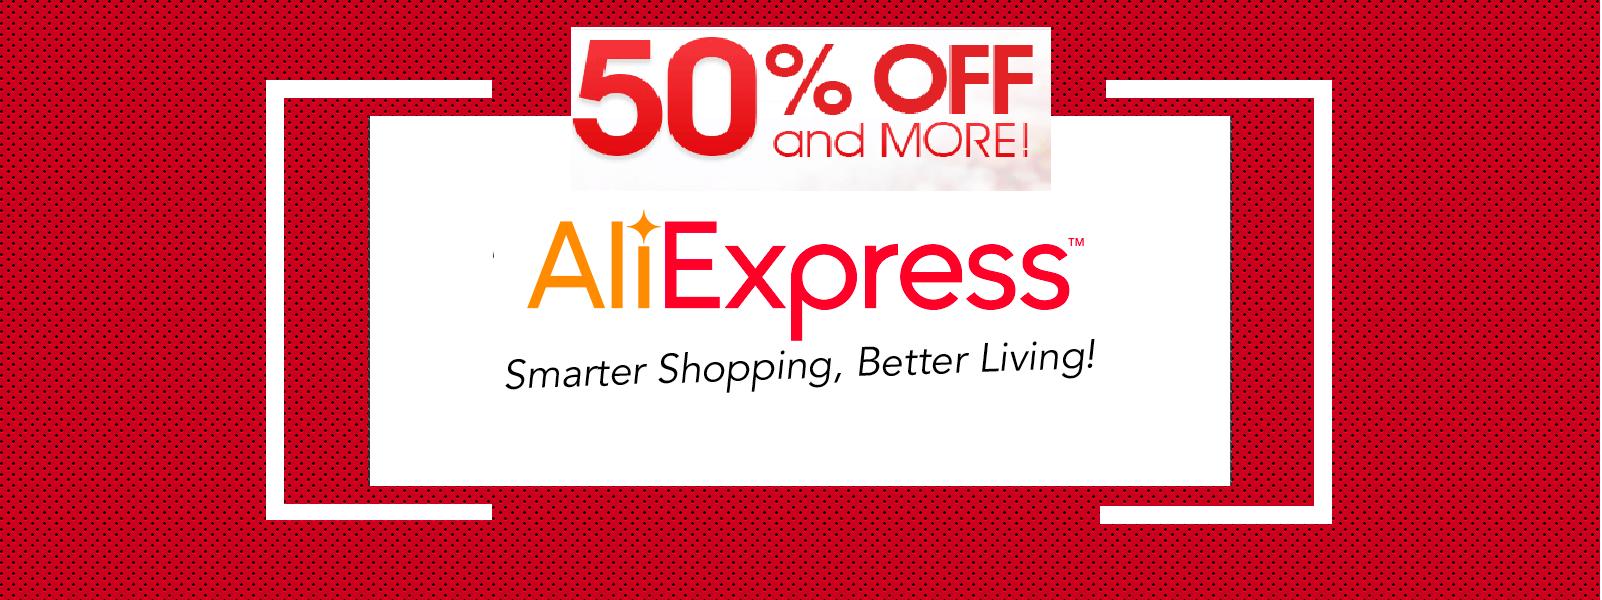 aliexpressoffer